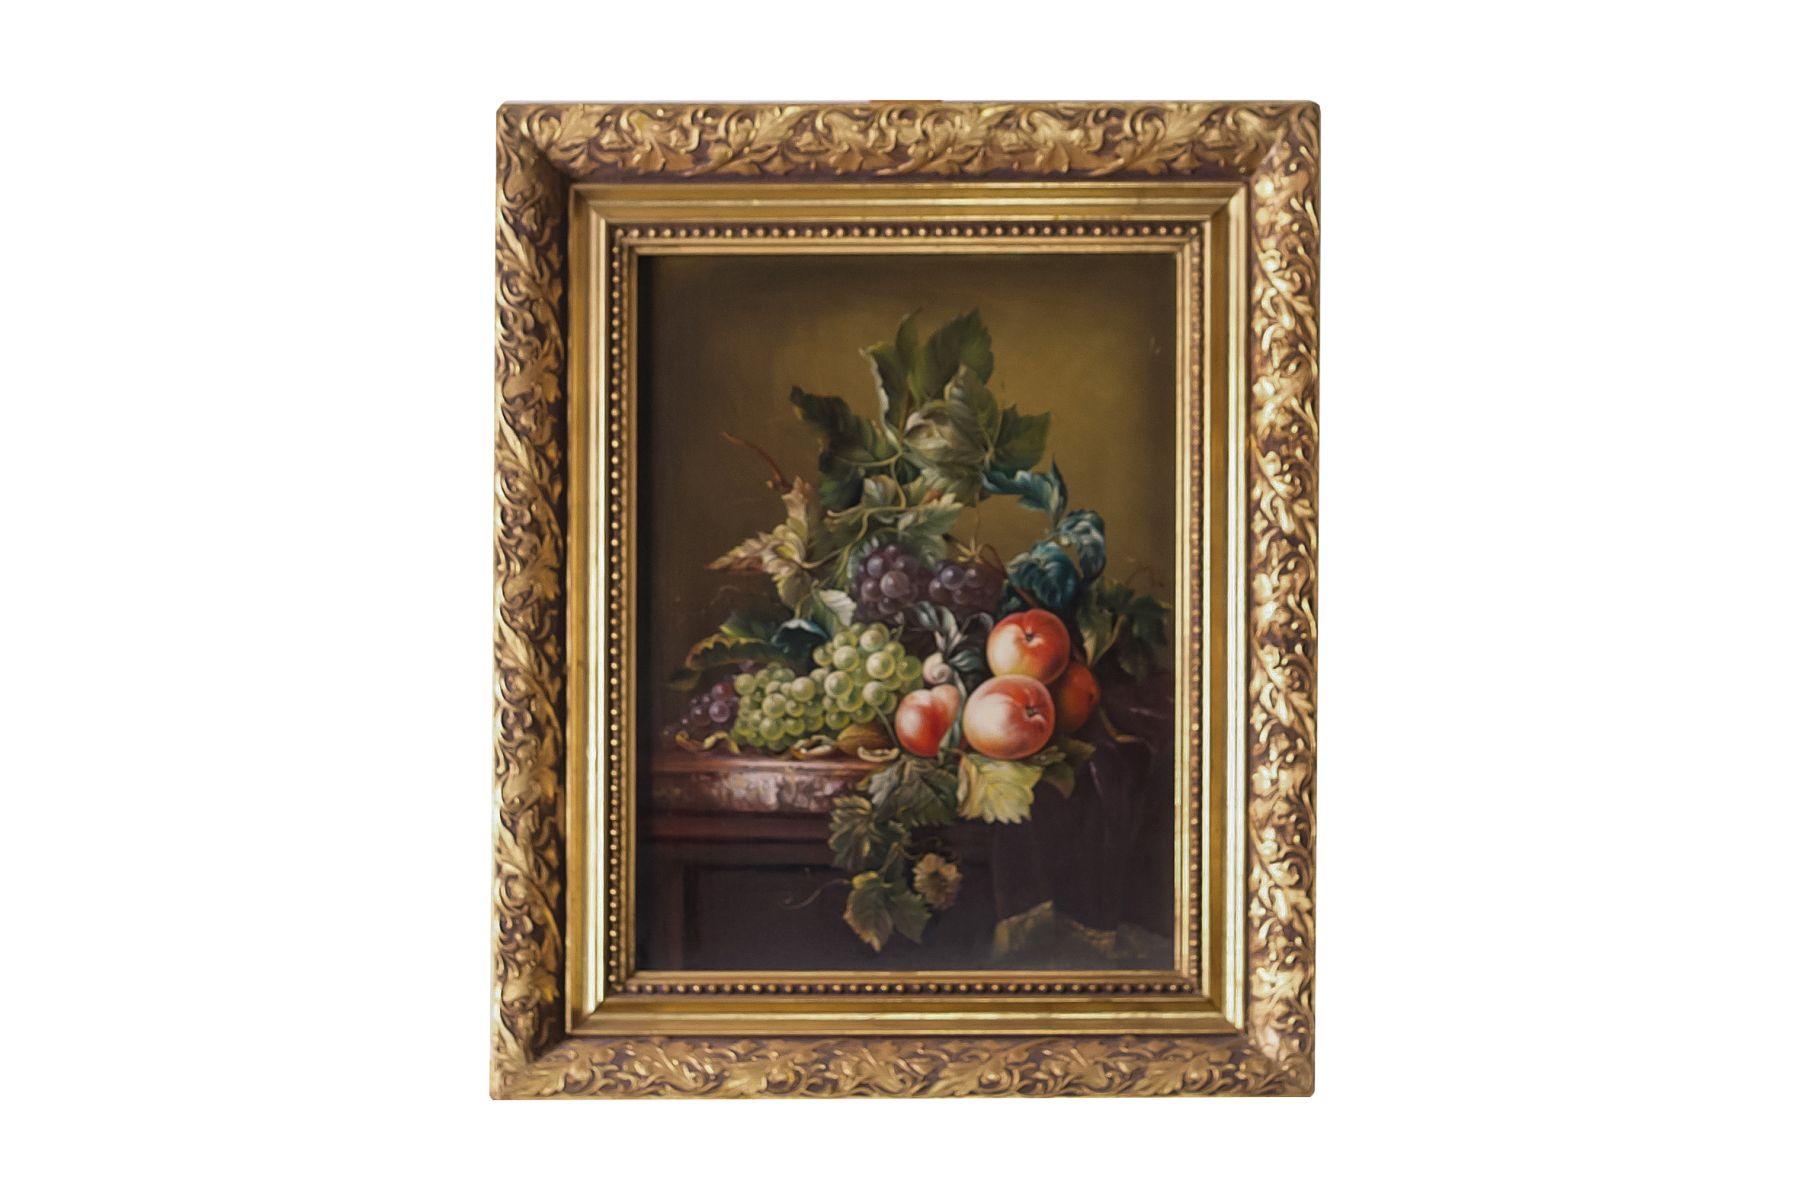 "#4 Gyula Kadas (1959) ""Still Life with Fruit"" | Gyula Kadas ( 1959) ""Stillleben mit Obst"" Image"